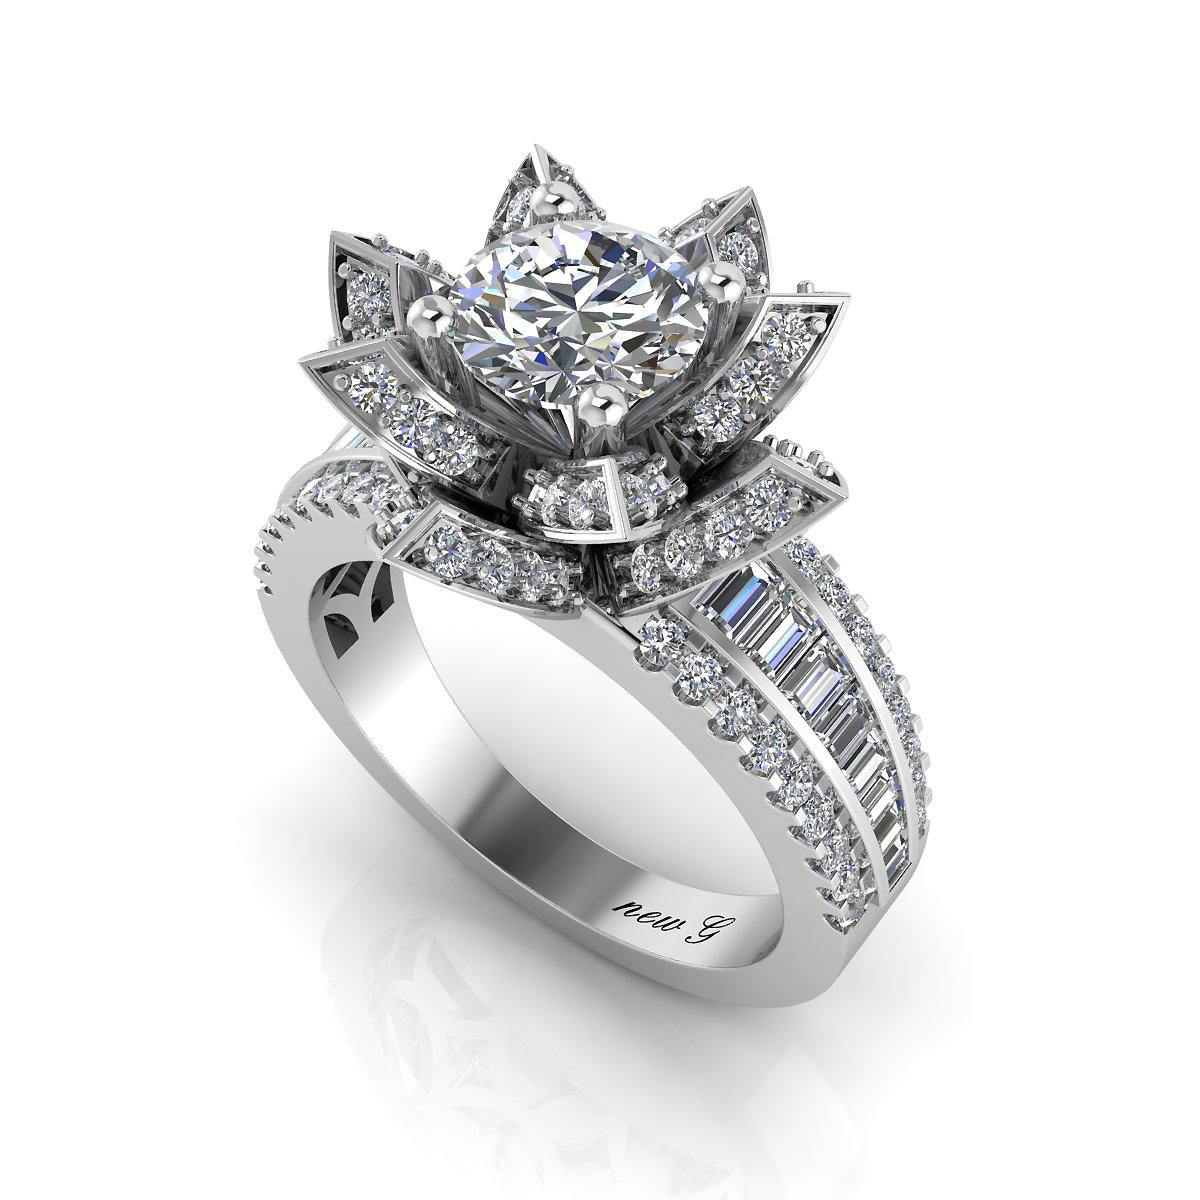 Lotus 100 ct tw 14k diamond engagement ring ng jewelry izmirmasajfo